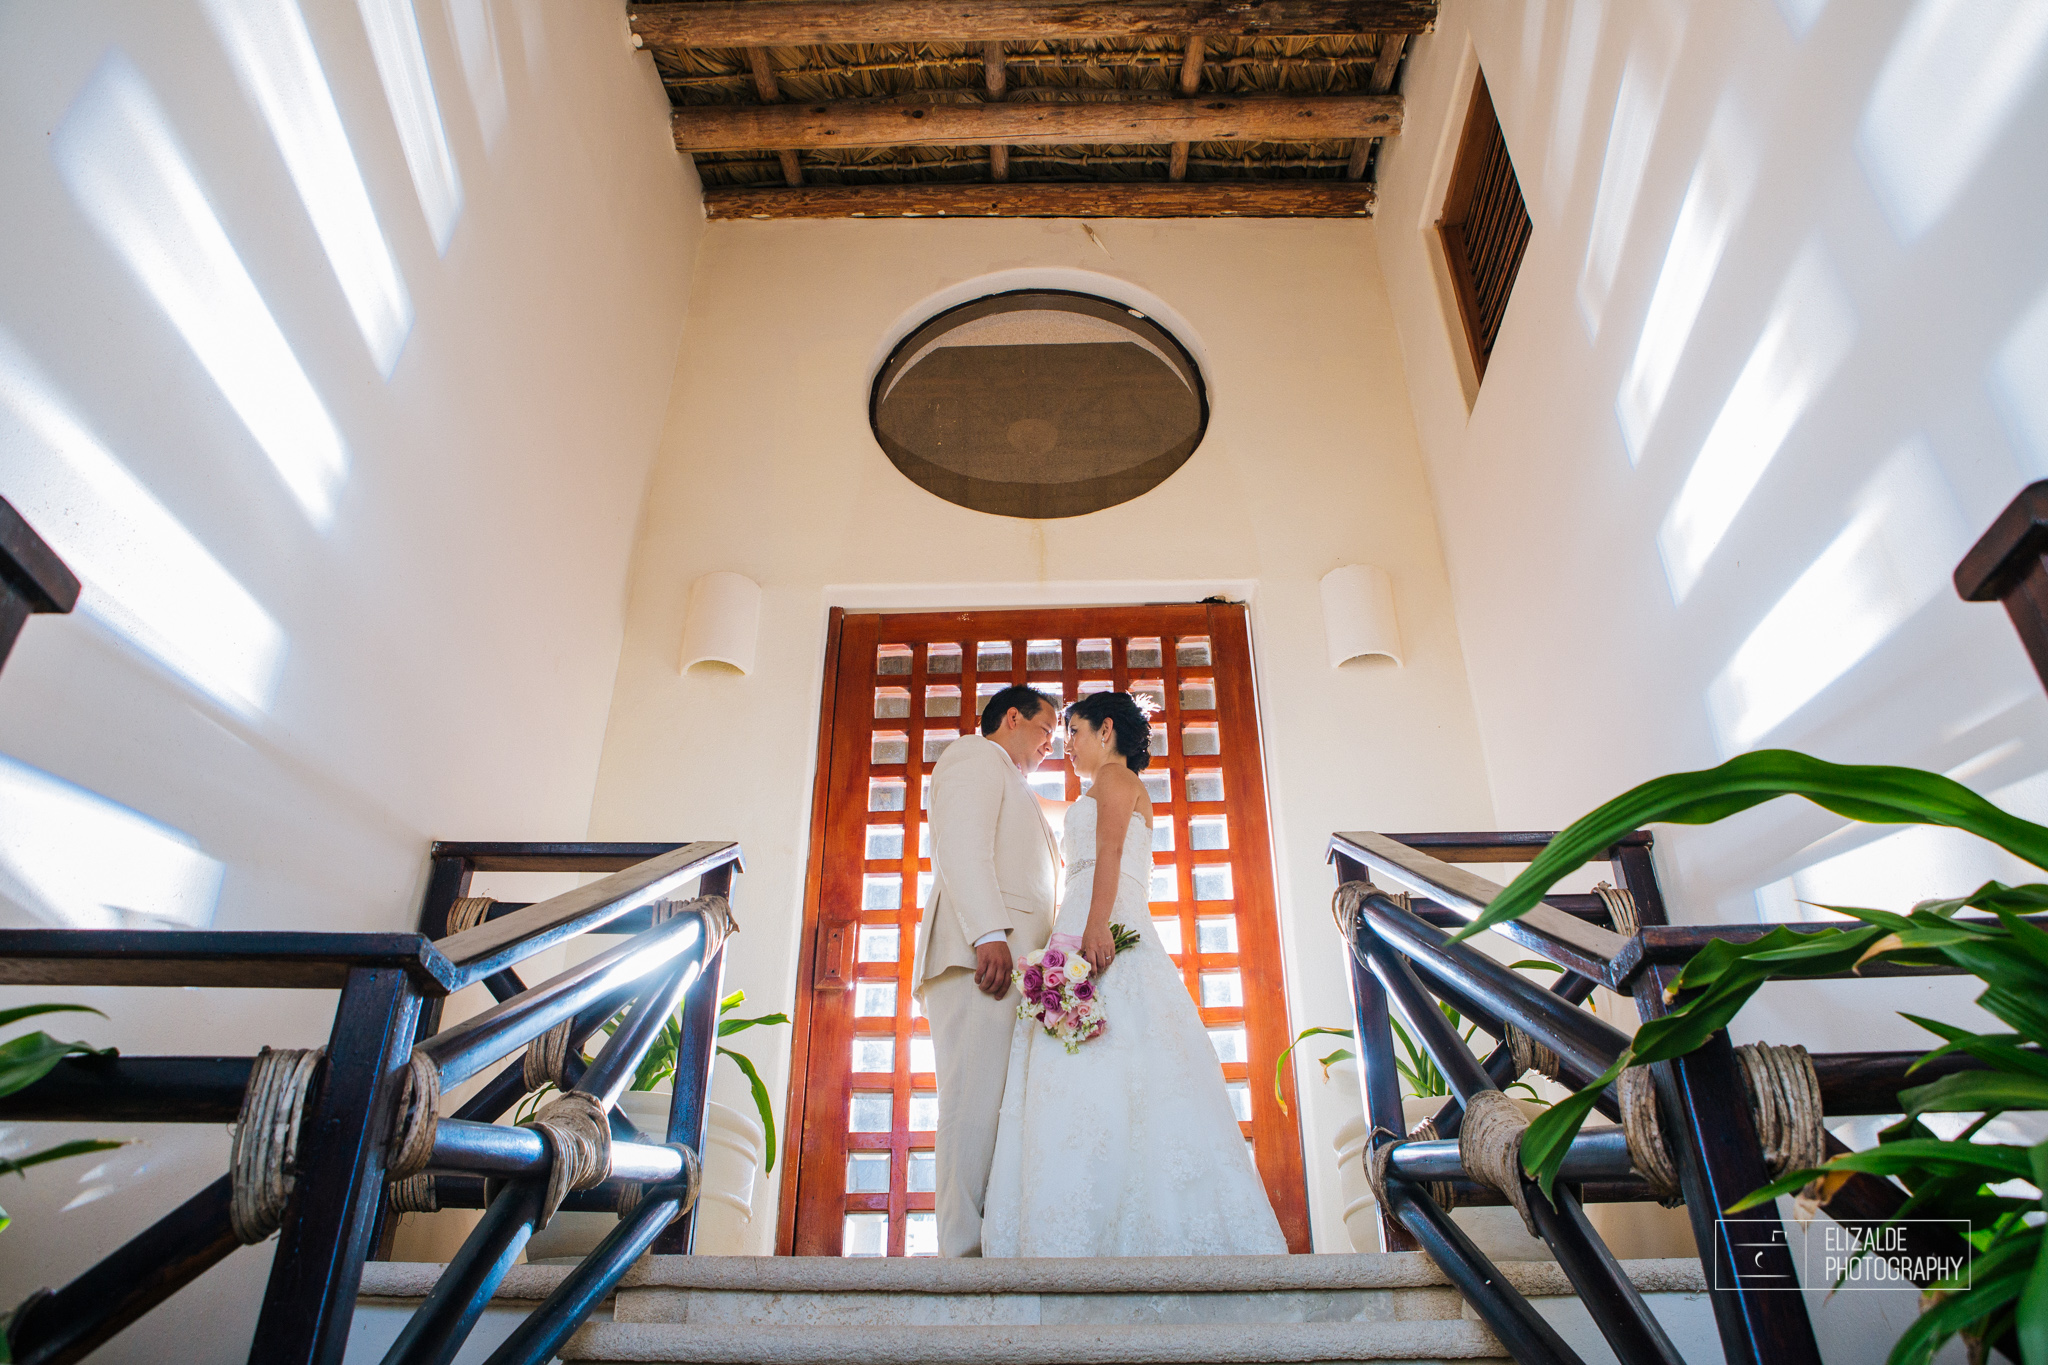 Pay and Ferran_Acapulco_Destination Wedding_Elizalde Photography-64.jpg